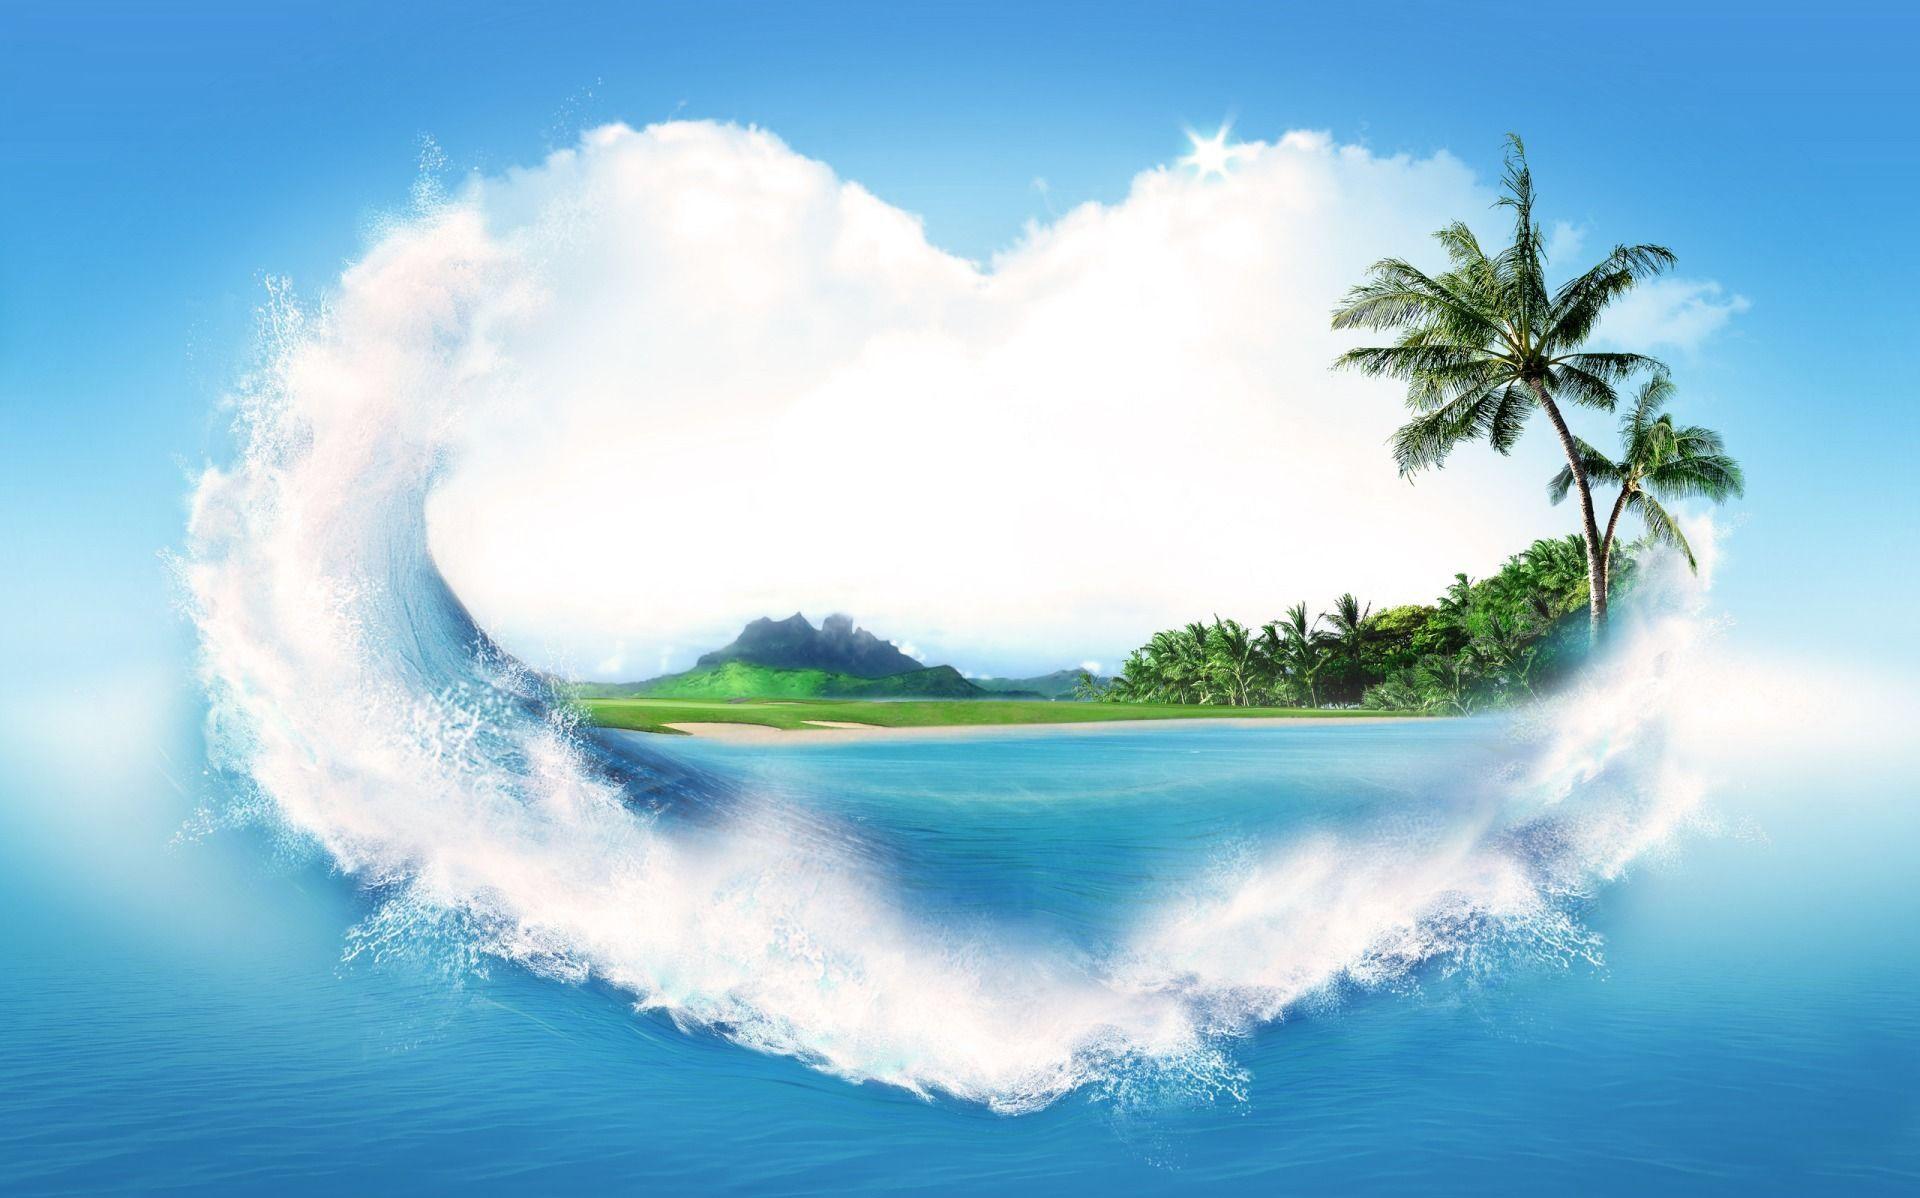 Full Hd Nature Wallpapers 1080p Desktop Hd Pictures Beautiful Nature Love 1920x1198 Wallpaper Teahub Io